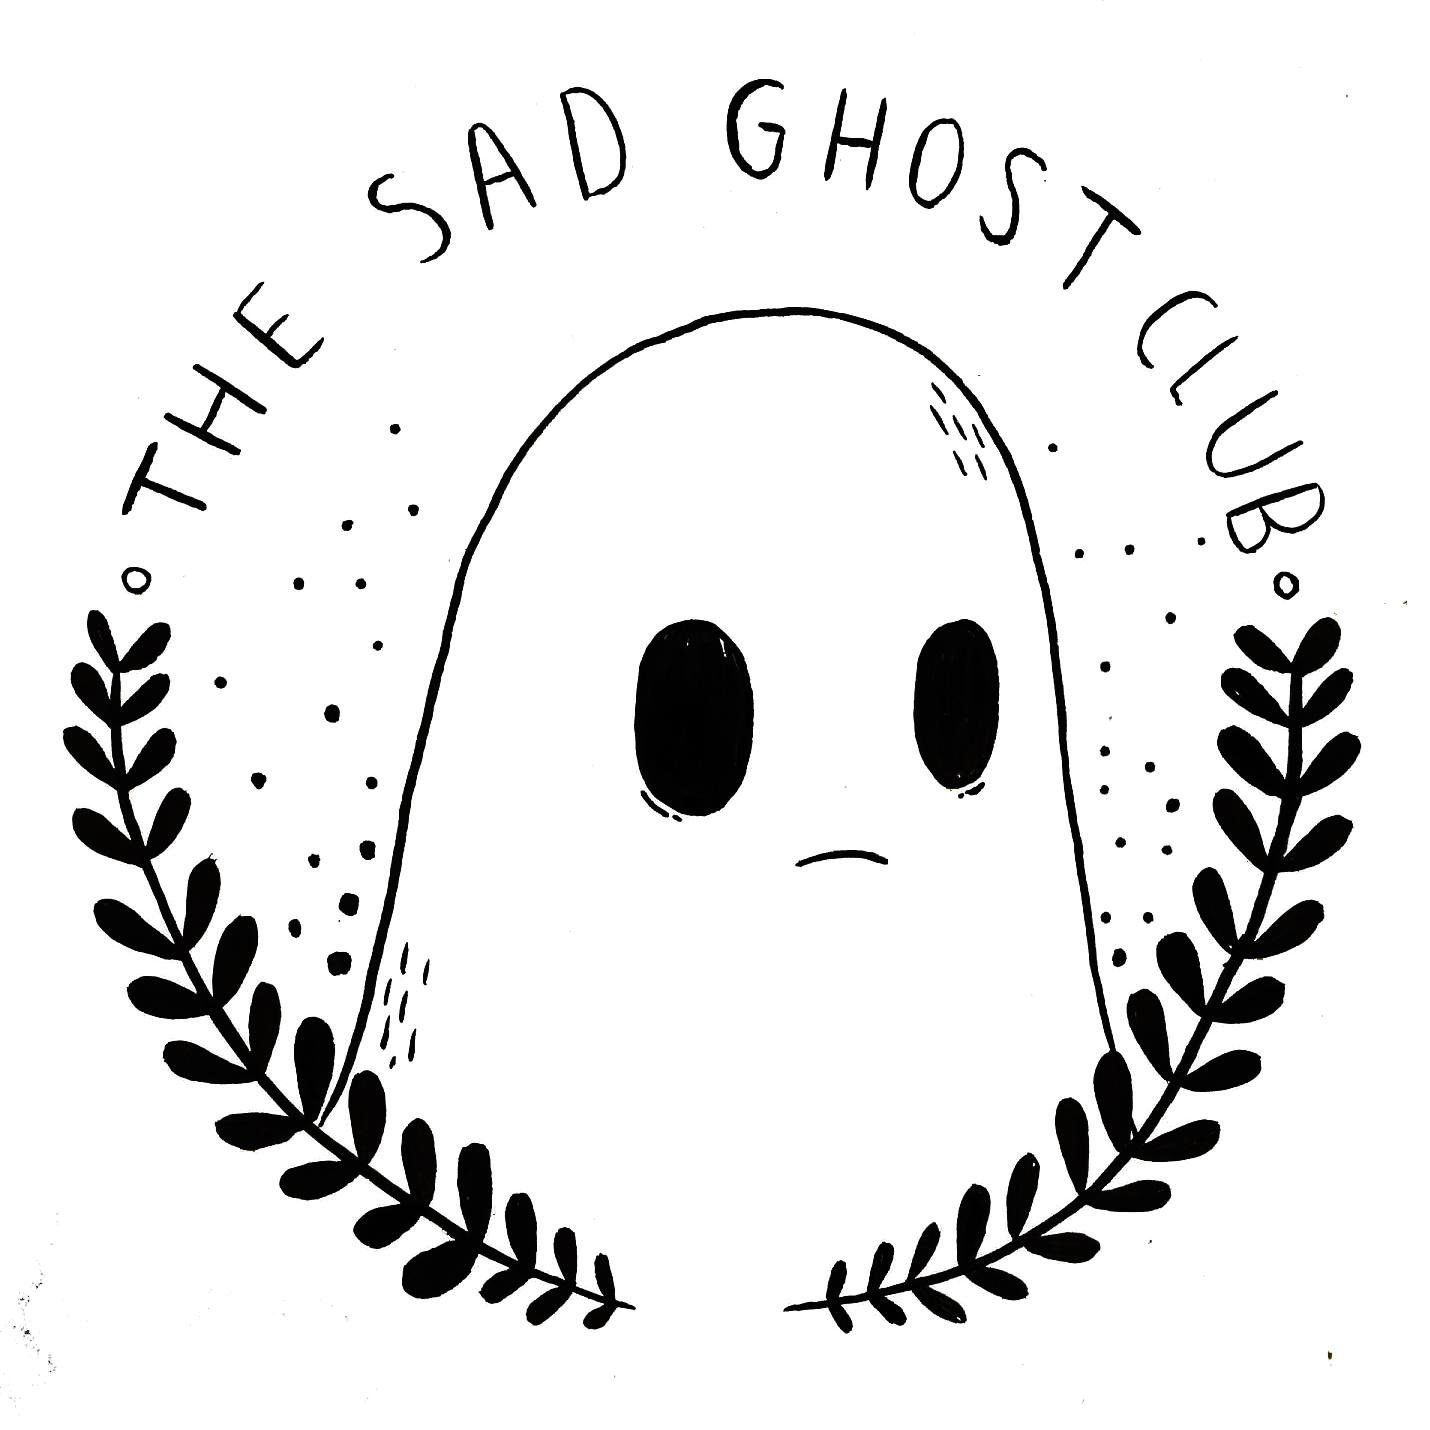 Sad ghost club google search tattoos in 2018 pinterest - Dessin triste ...